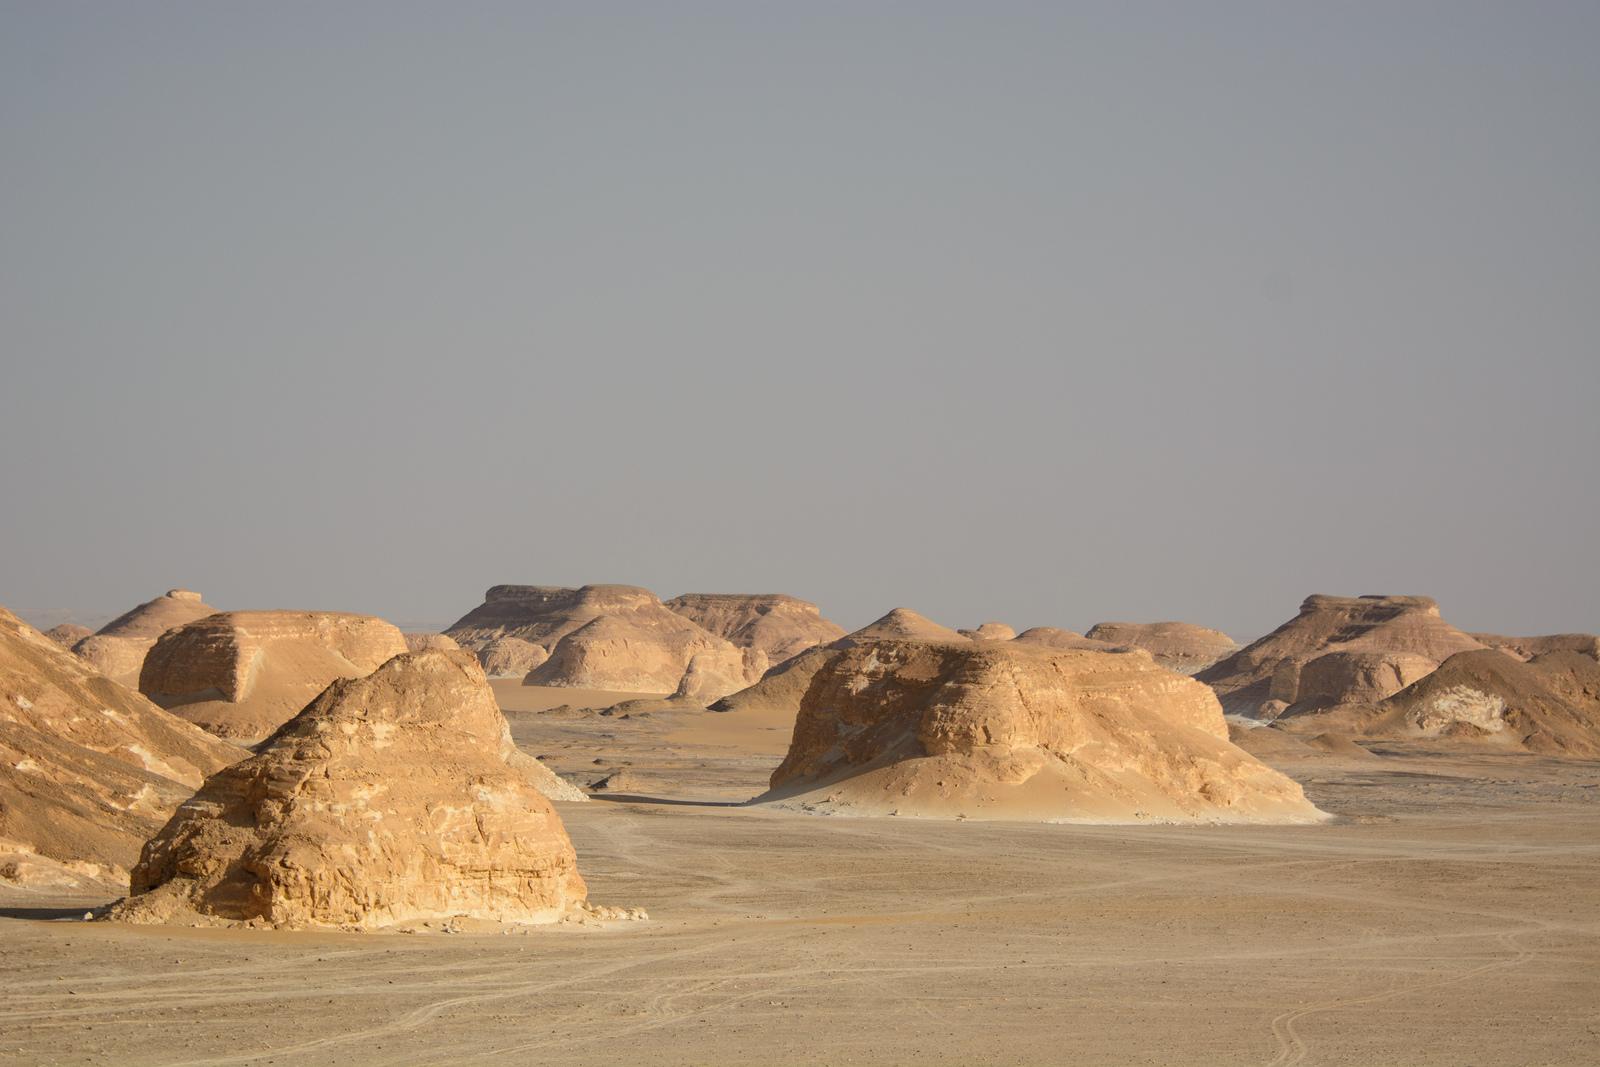 Day 05: Farafra & Dakhla Oasis